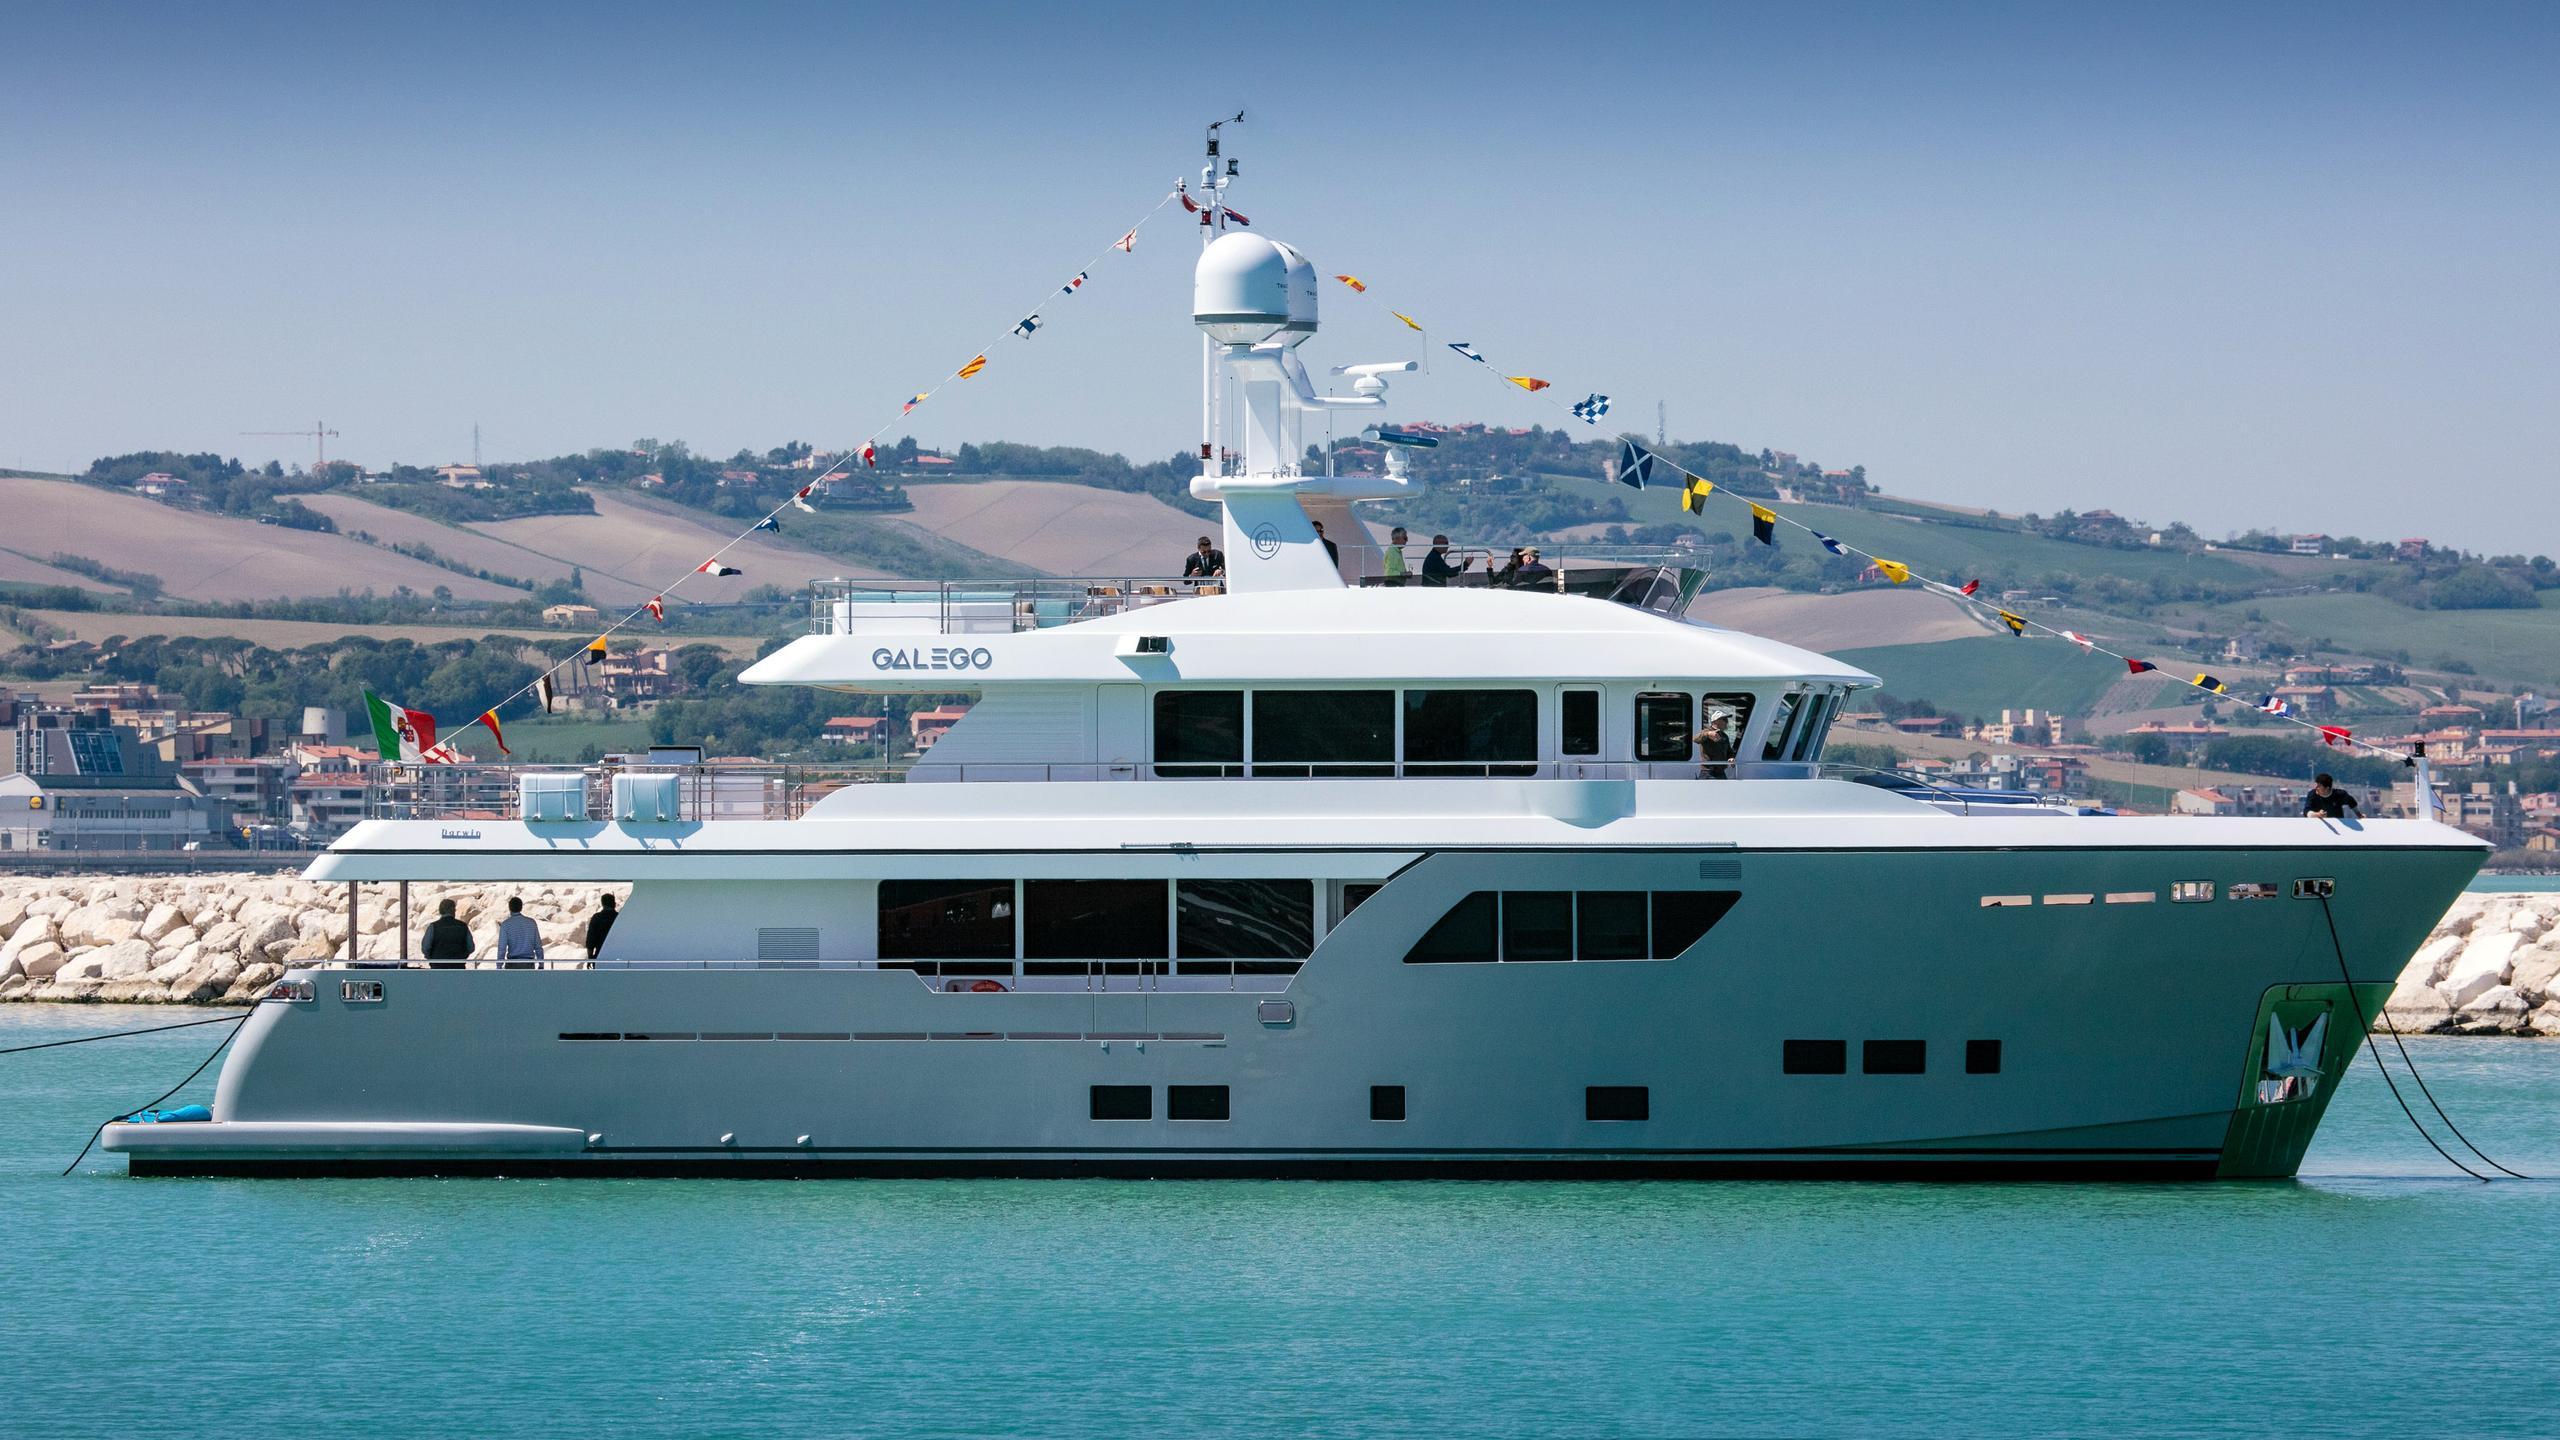 galego darwin 102 motoryacht cantiere delle marche 2017 31m launch profile